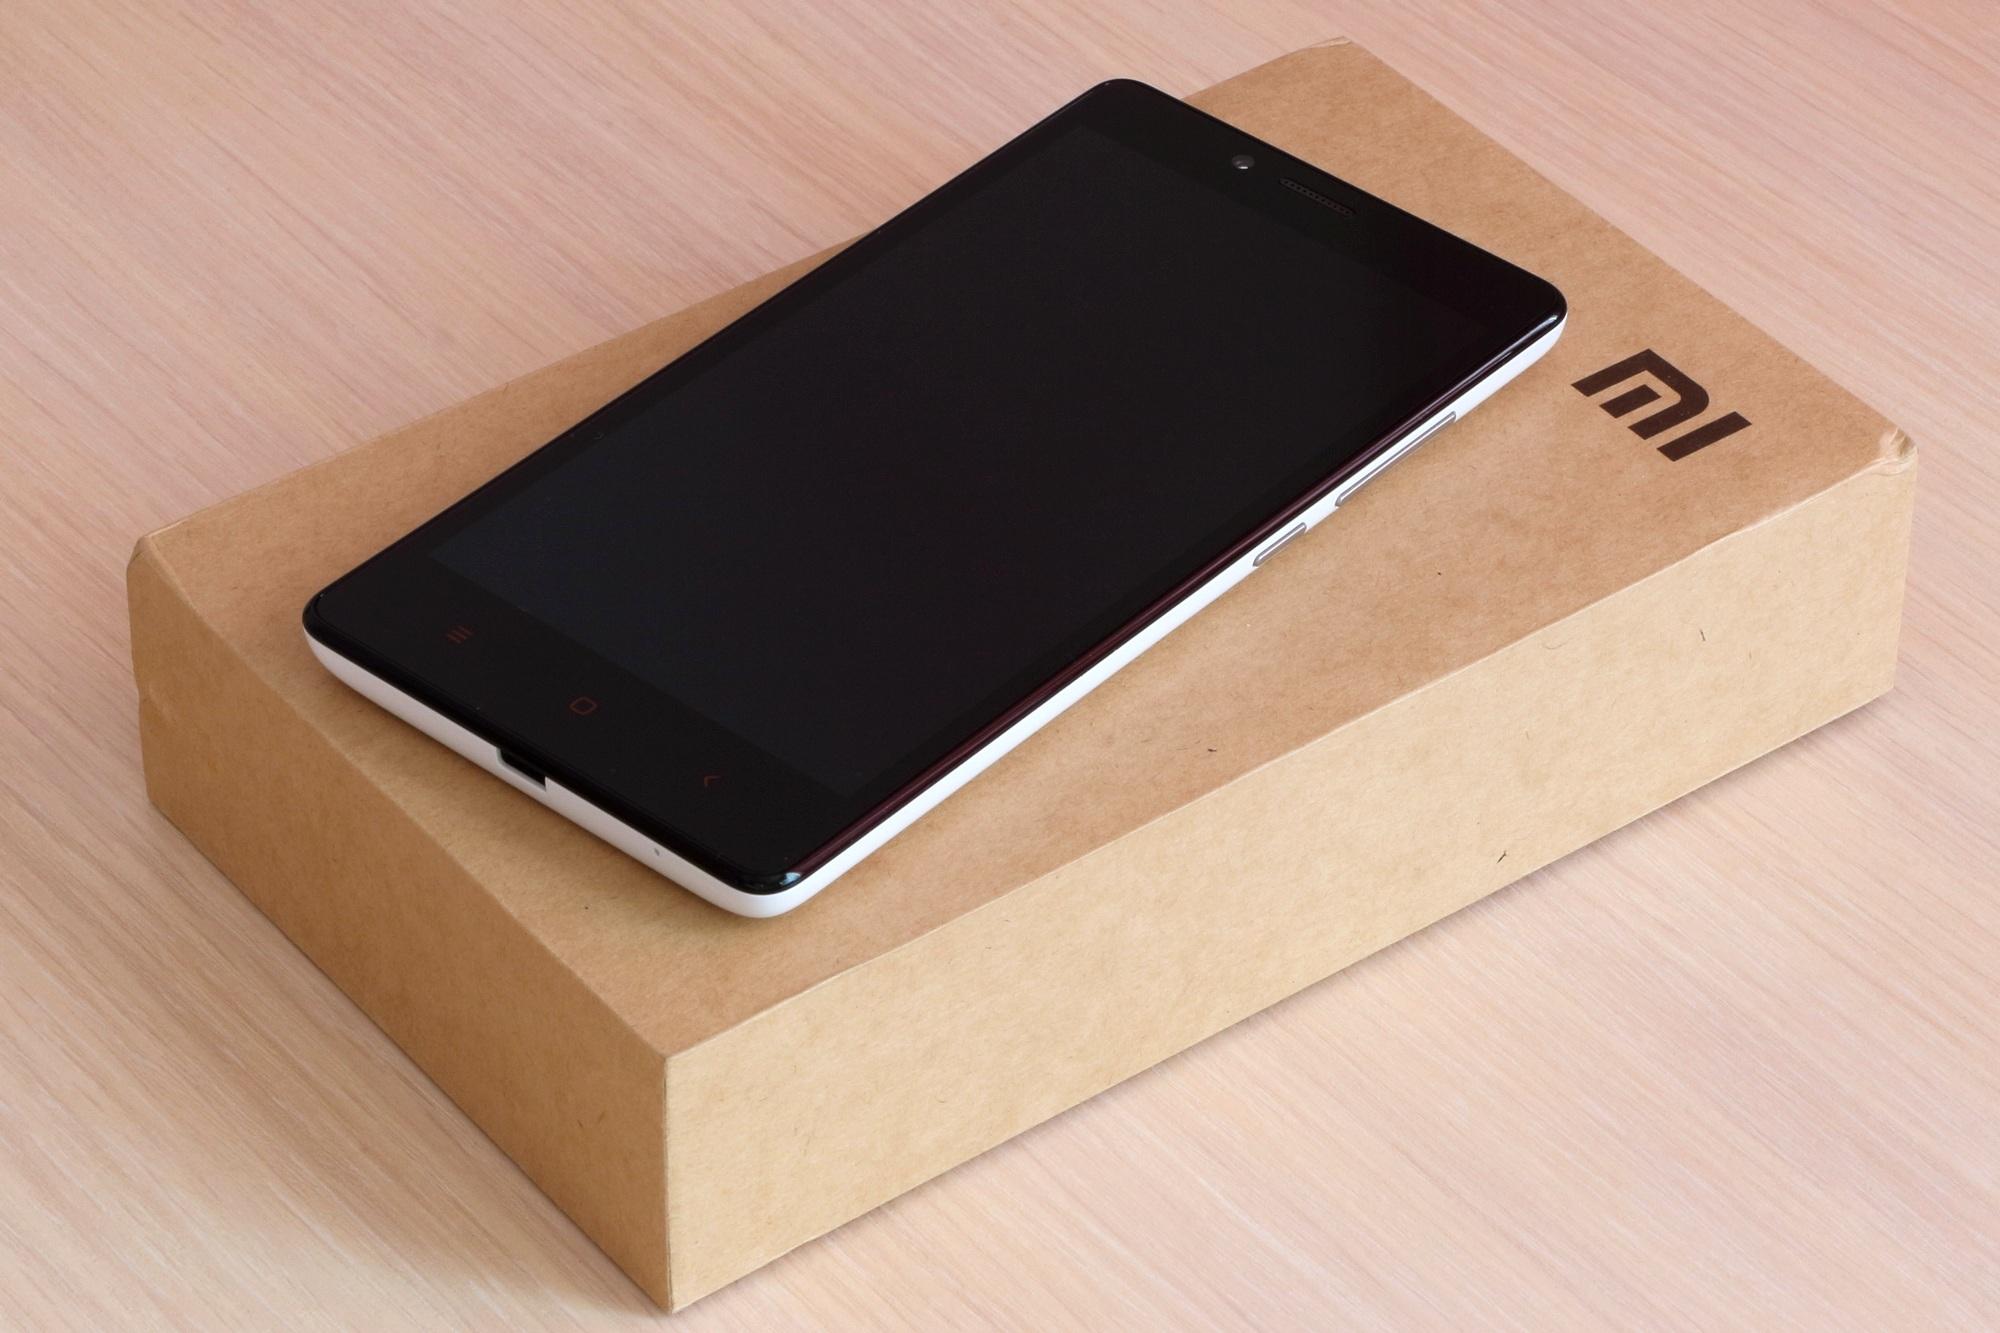 comprar un móvil chino - buscar información